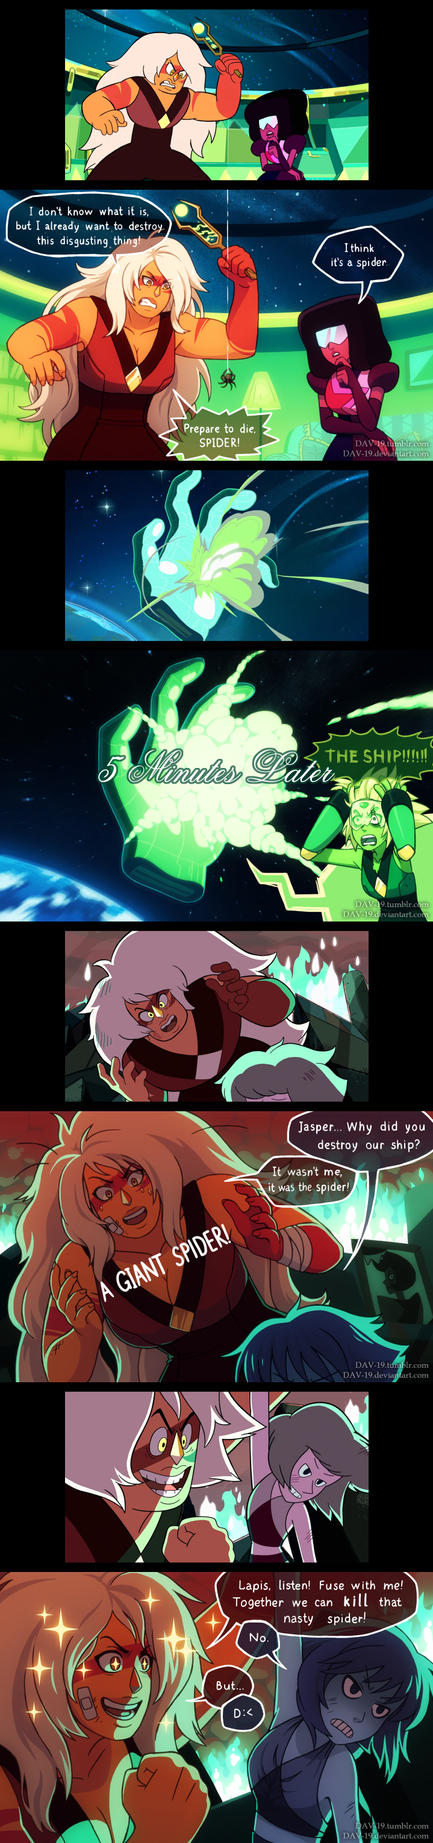 Steven Universe Screenshots Redraw by DAV-19